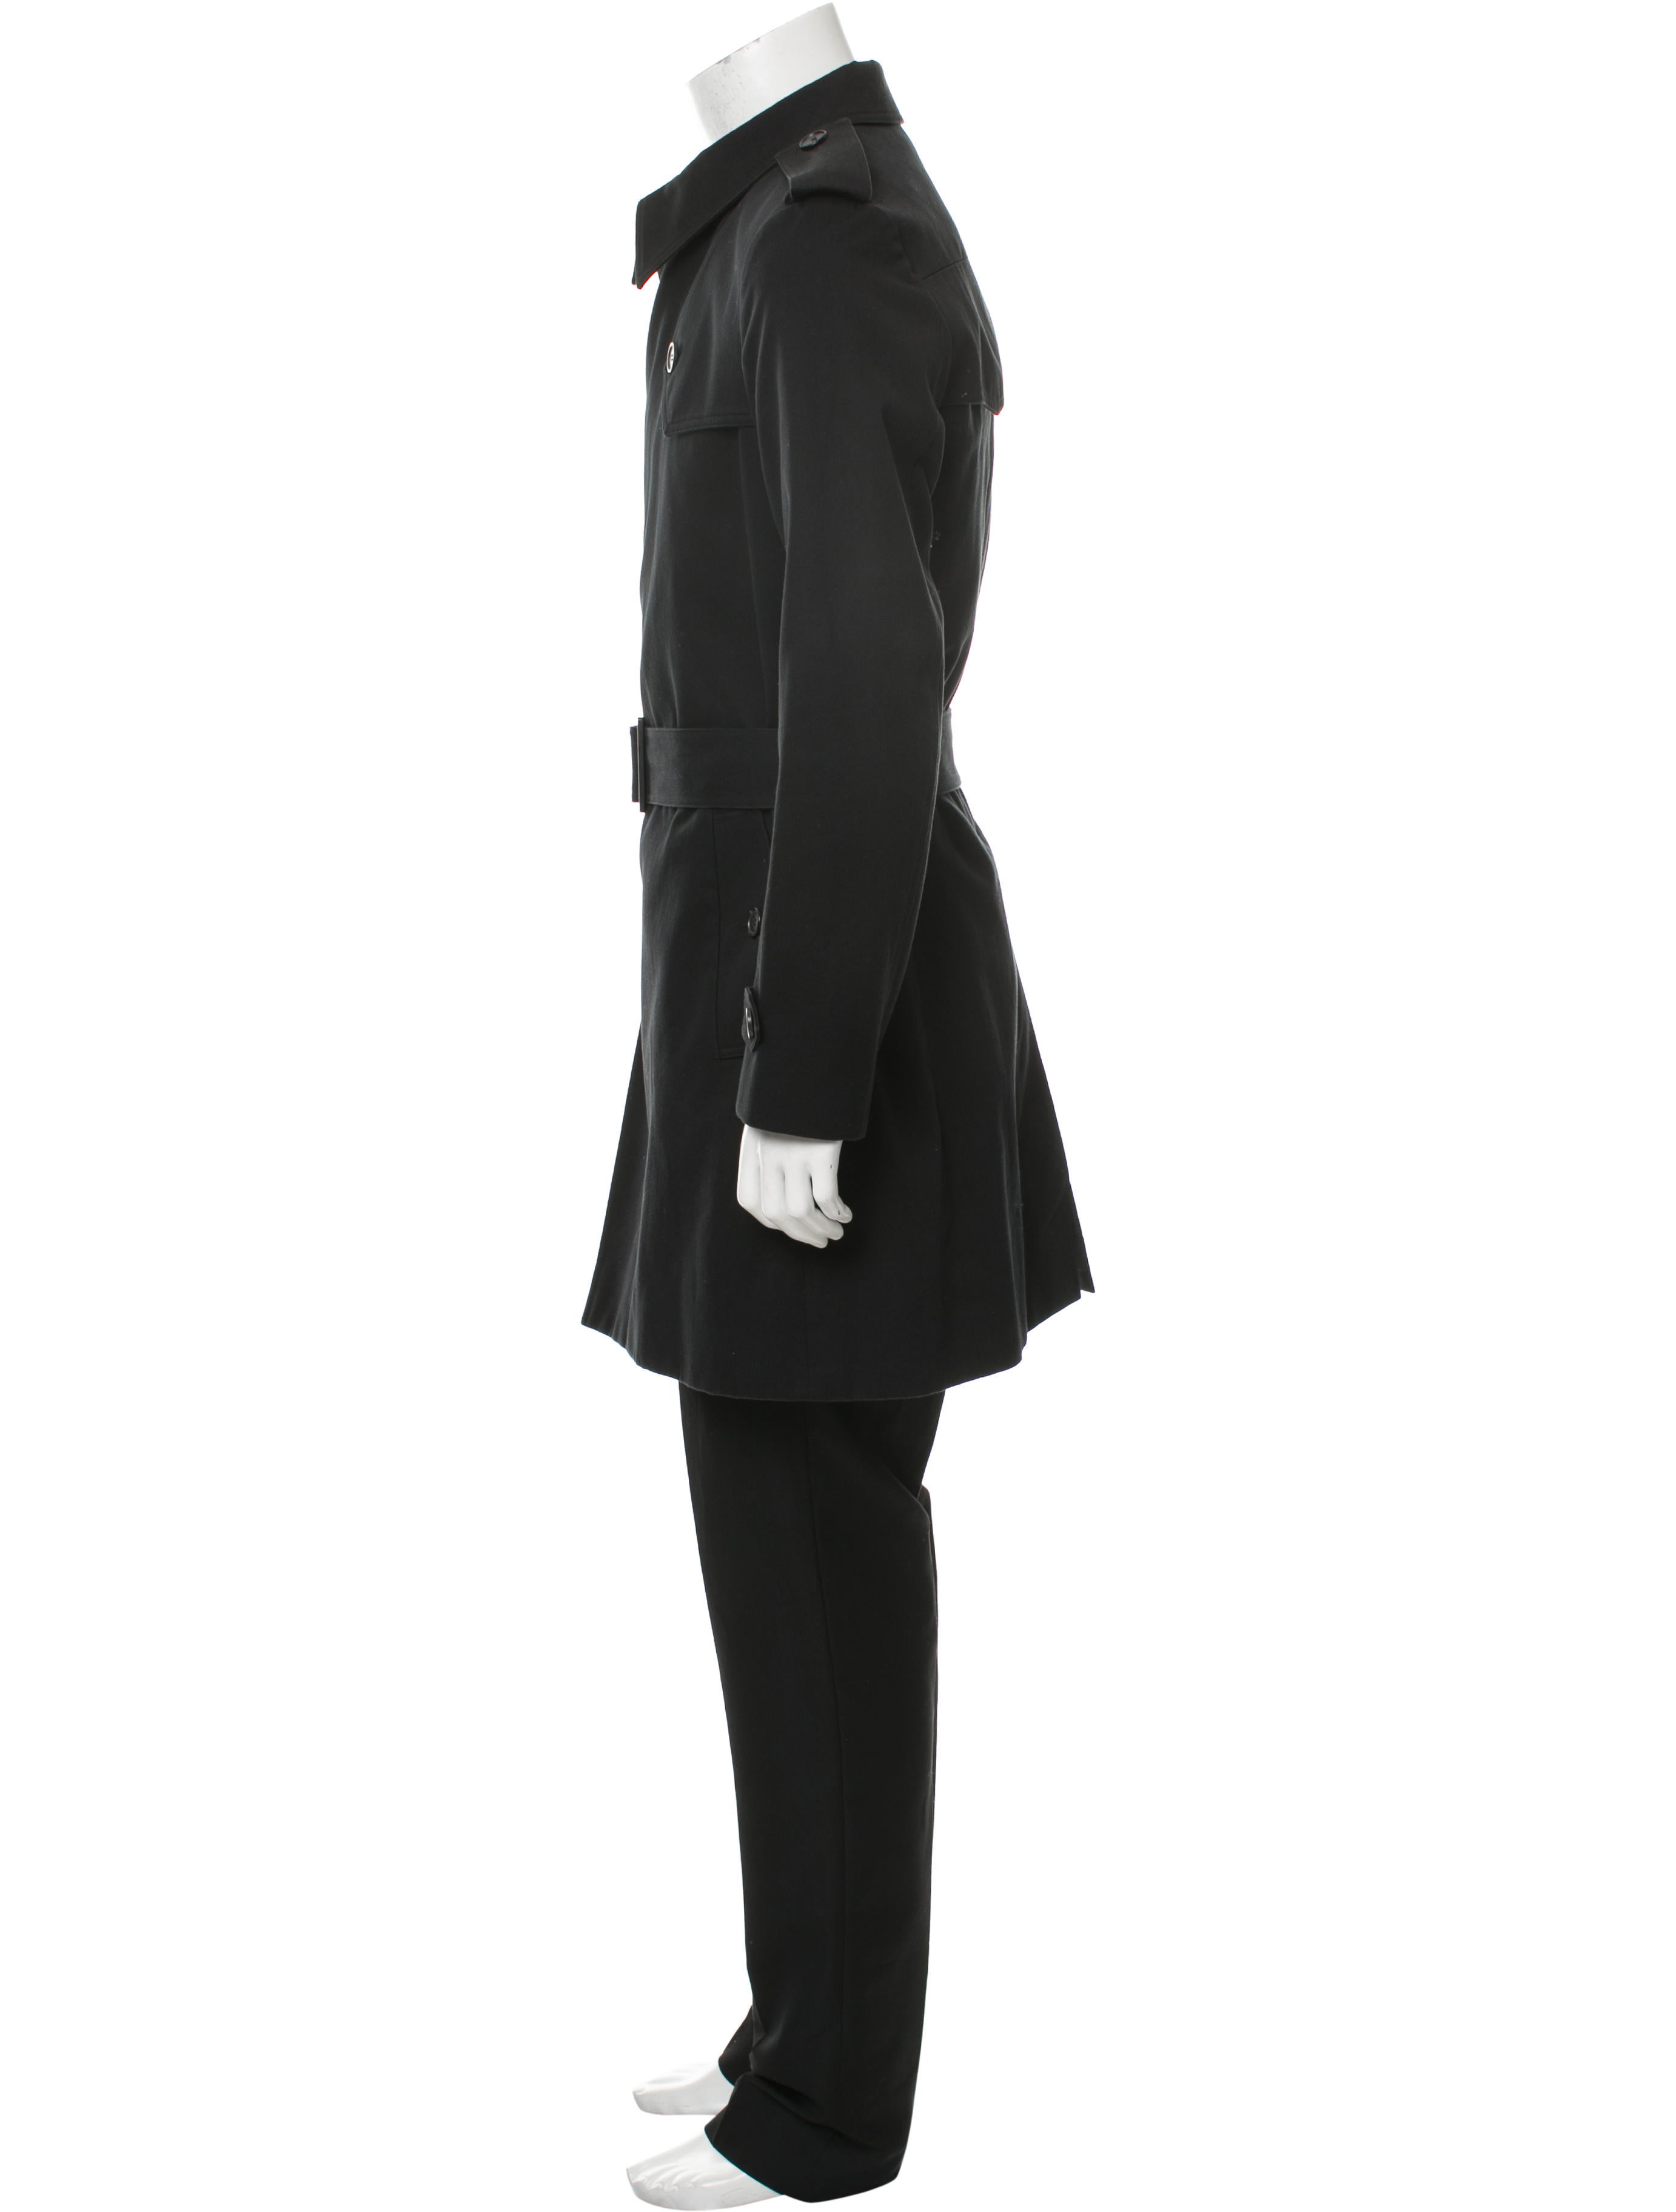 dior homme belted trench coat clothing hmm23697 the. Black Bedroom Furniture Sets. Home Design Ideas